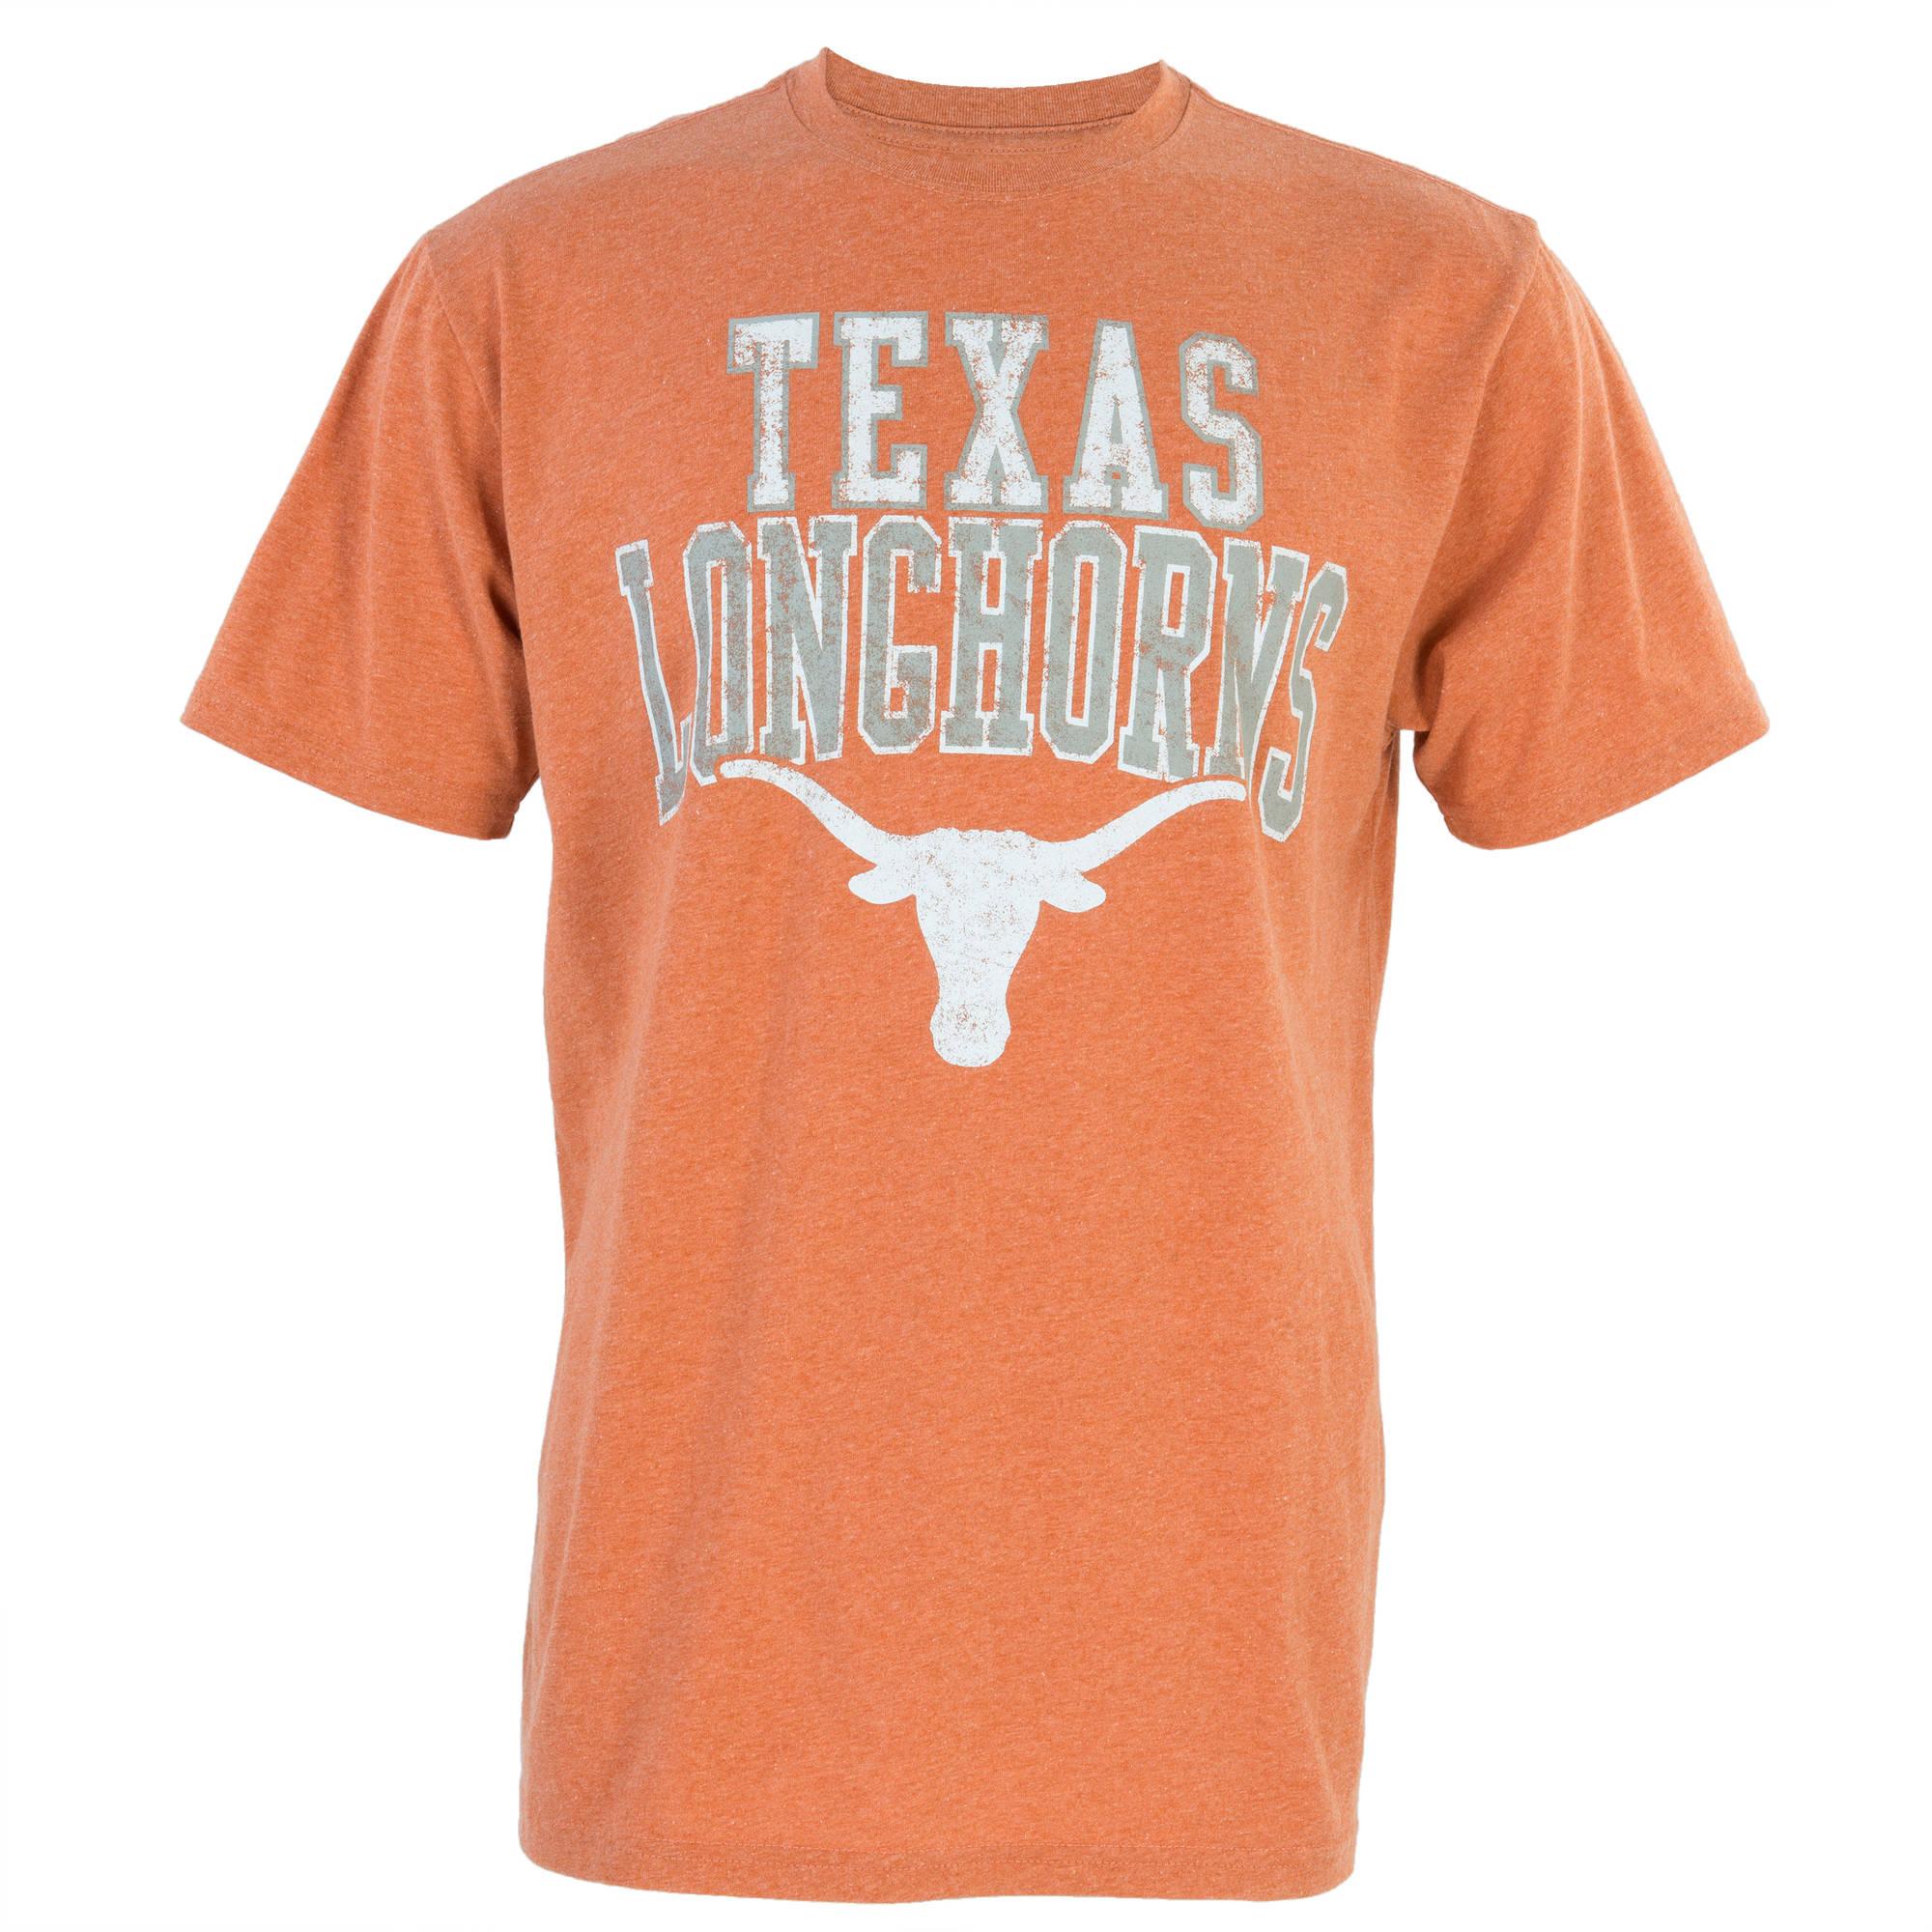 NCAA Texas Longhorns Big Men's Validated Vintage Tee, 2XL